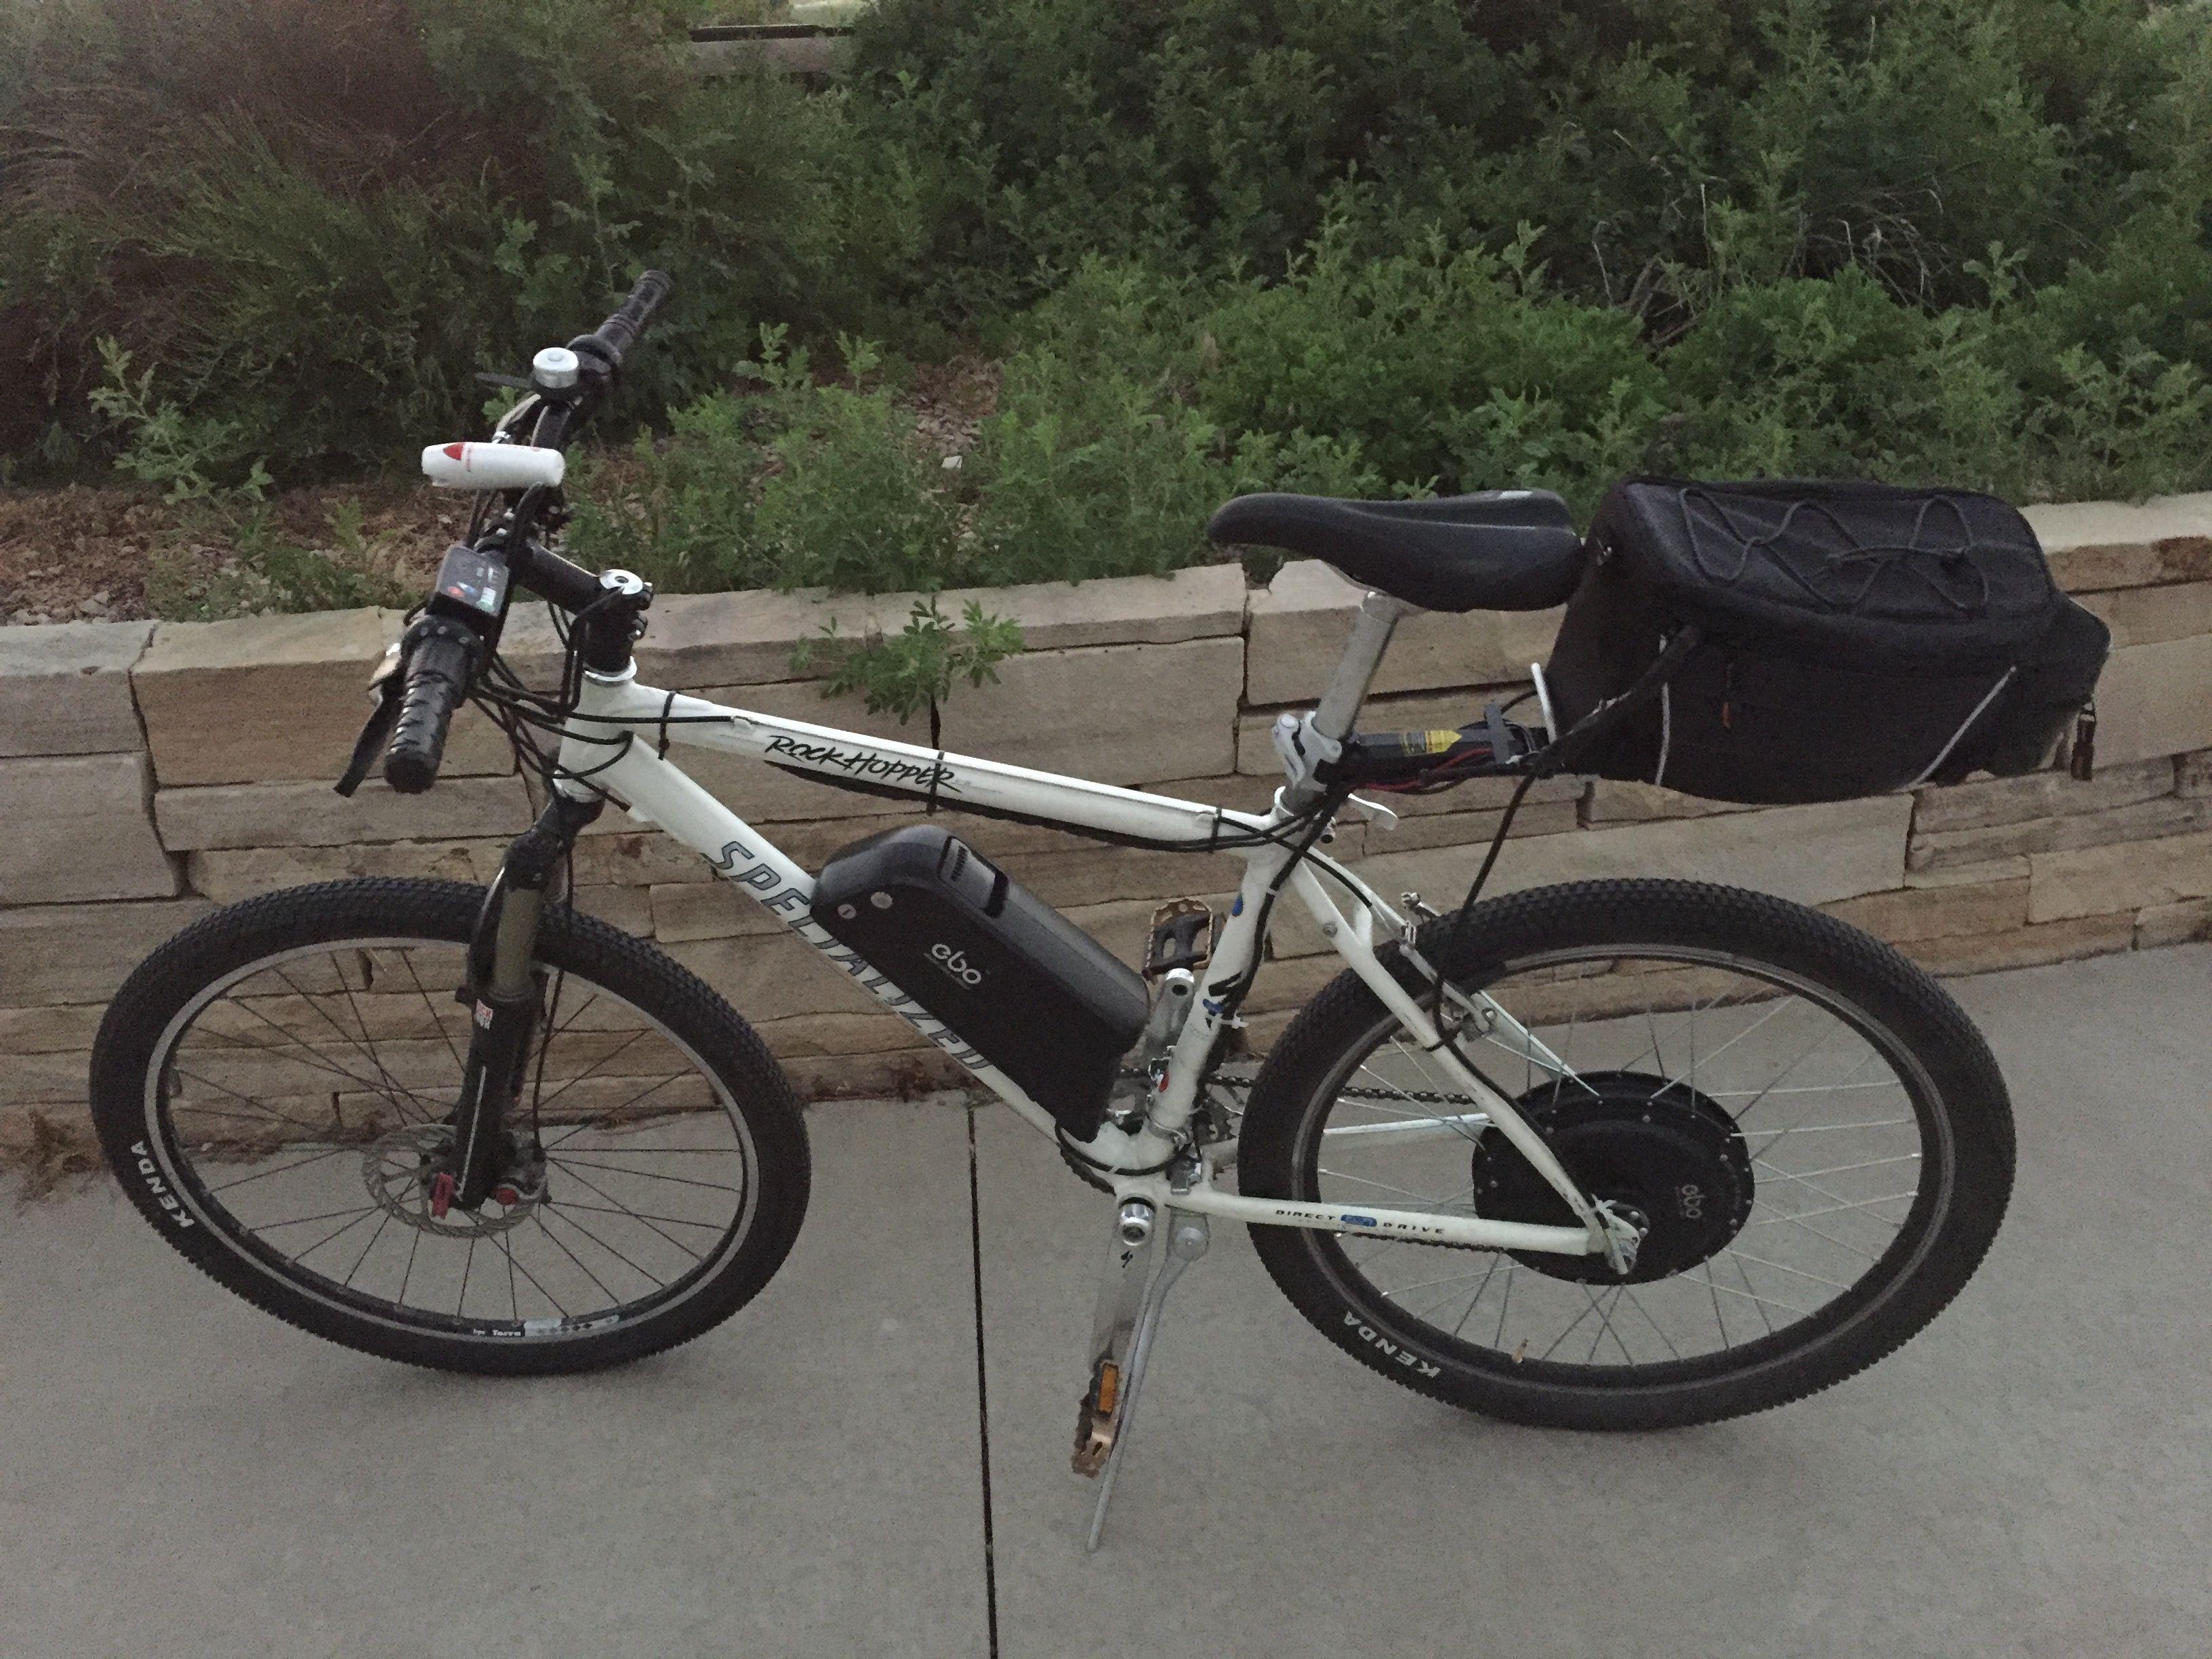 Ebo Mountaineer Electric Bike Kit Installed On A Specialized Rock Hopper Electric Bike Kits Bike Kit Bicycle